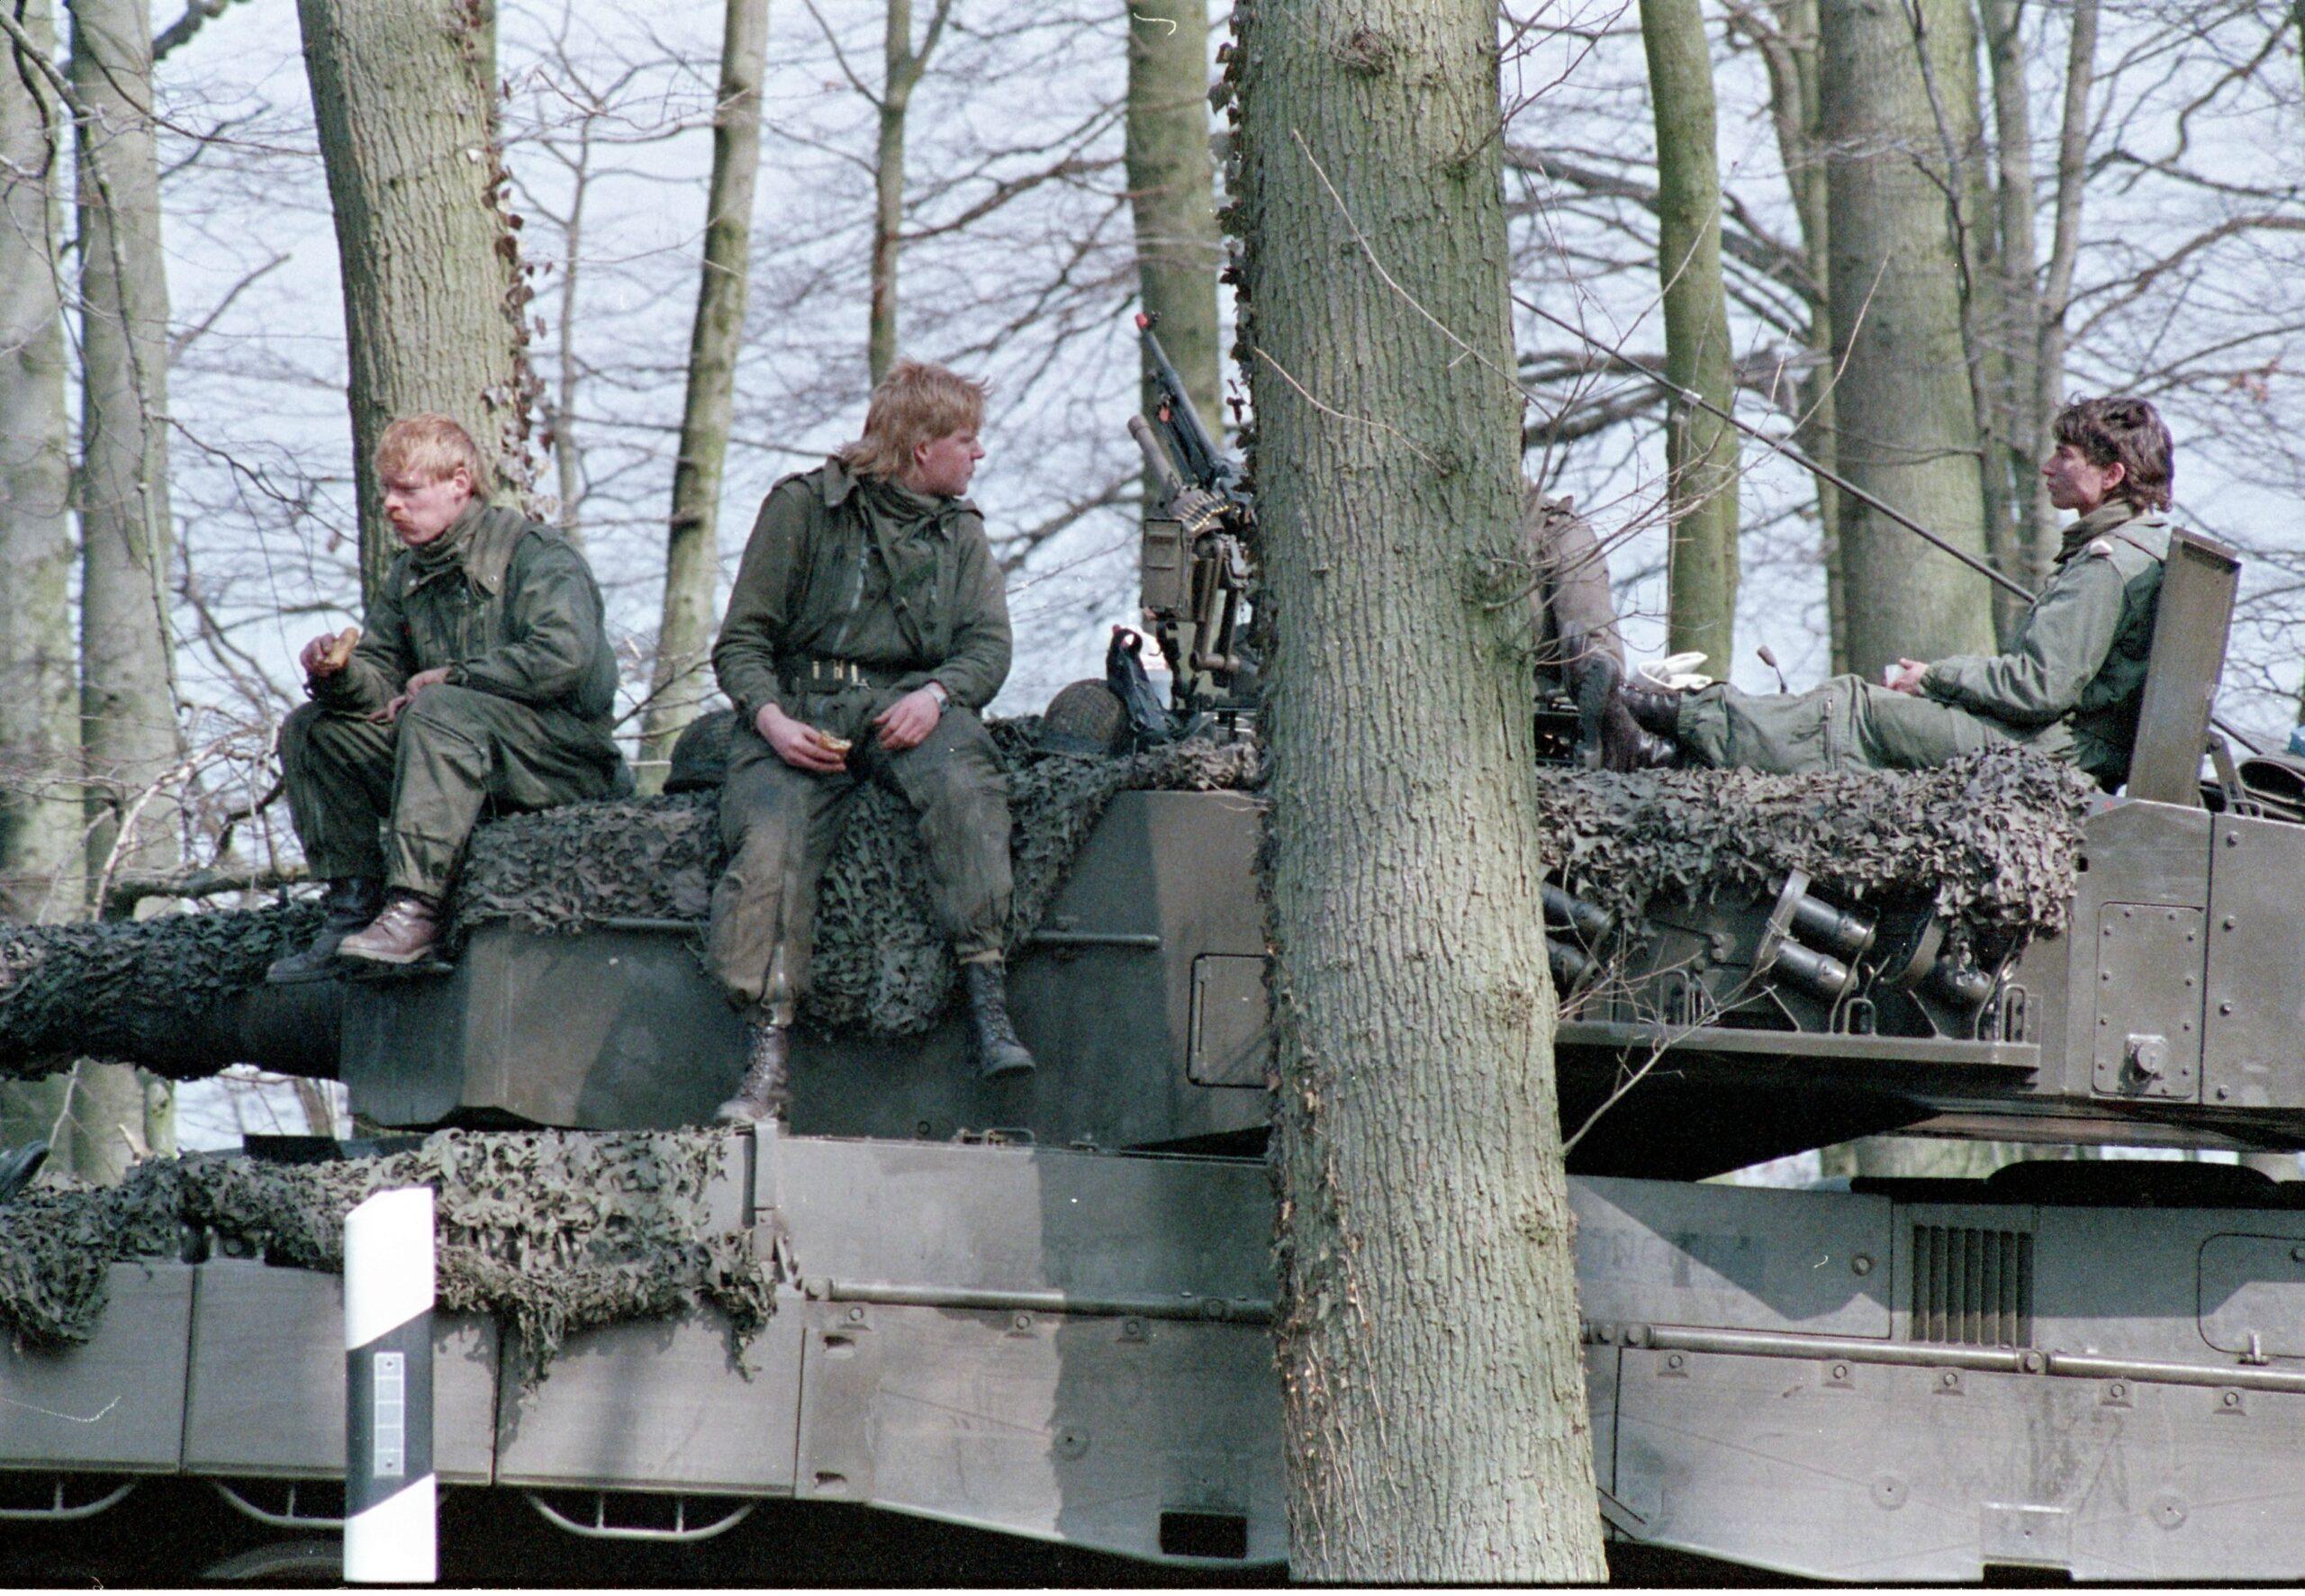 1983 1987 B Esk 103 Verkbat Veel oefeningen Inz. Wmr I Jan Pol 52